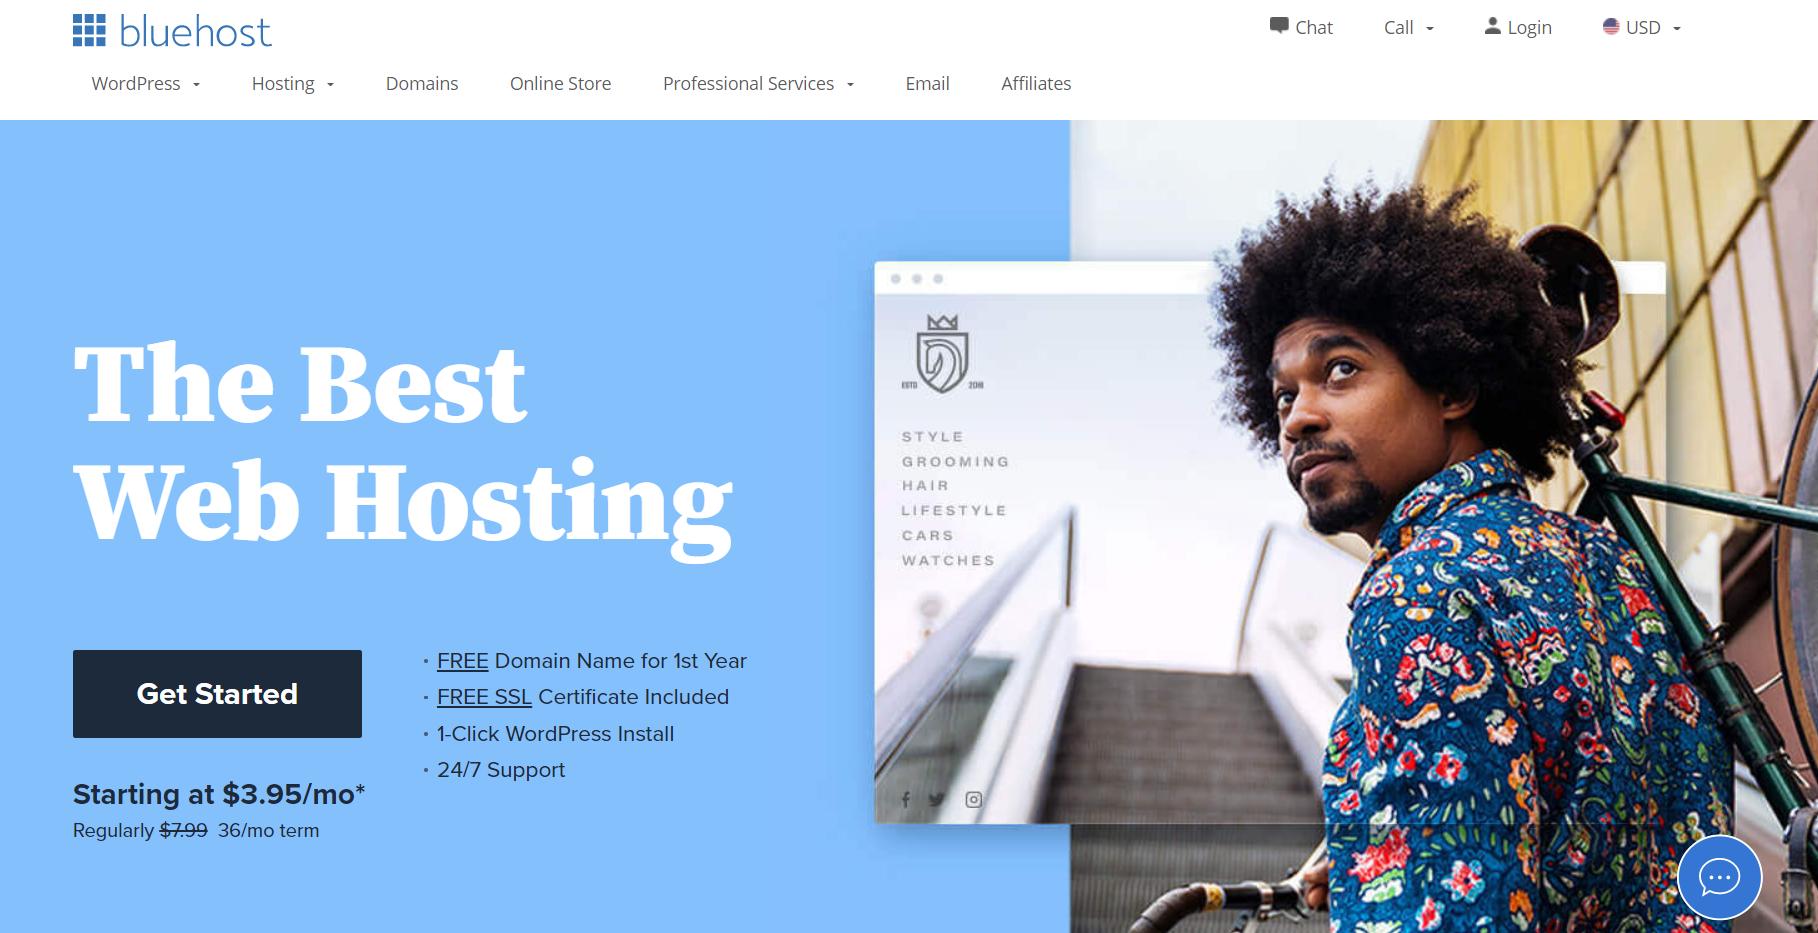 bluehost - digitally atanu